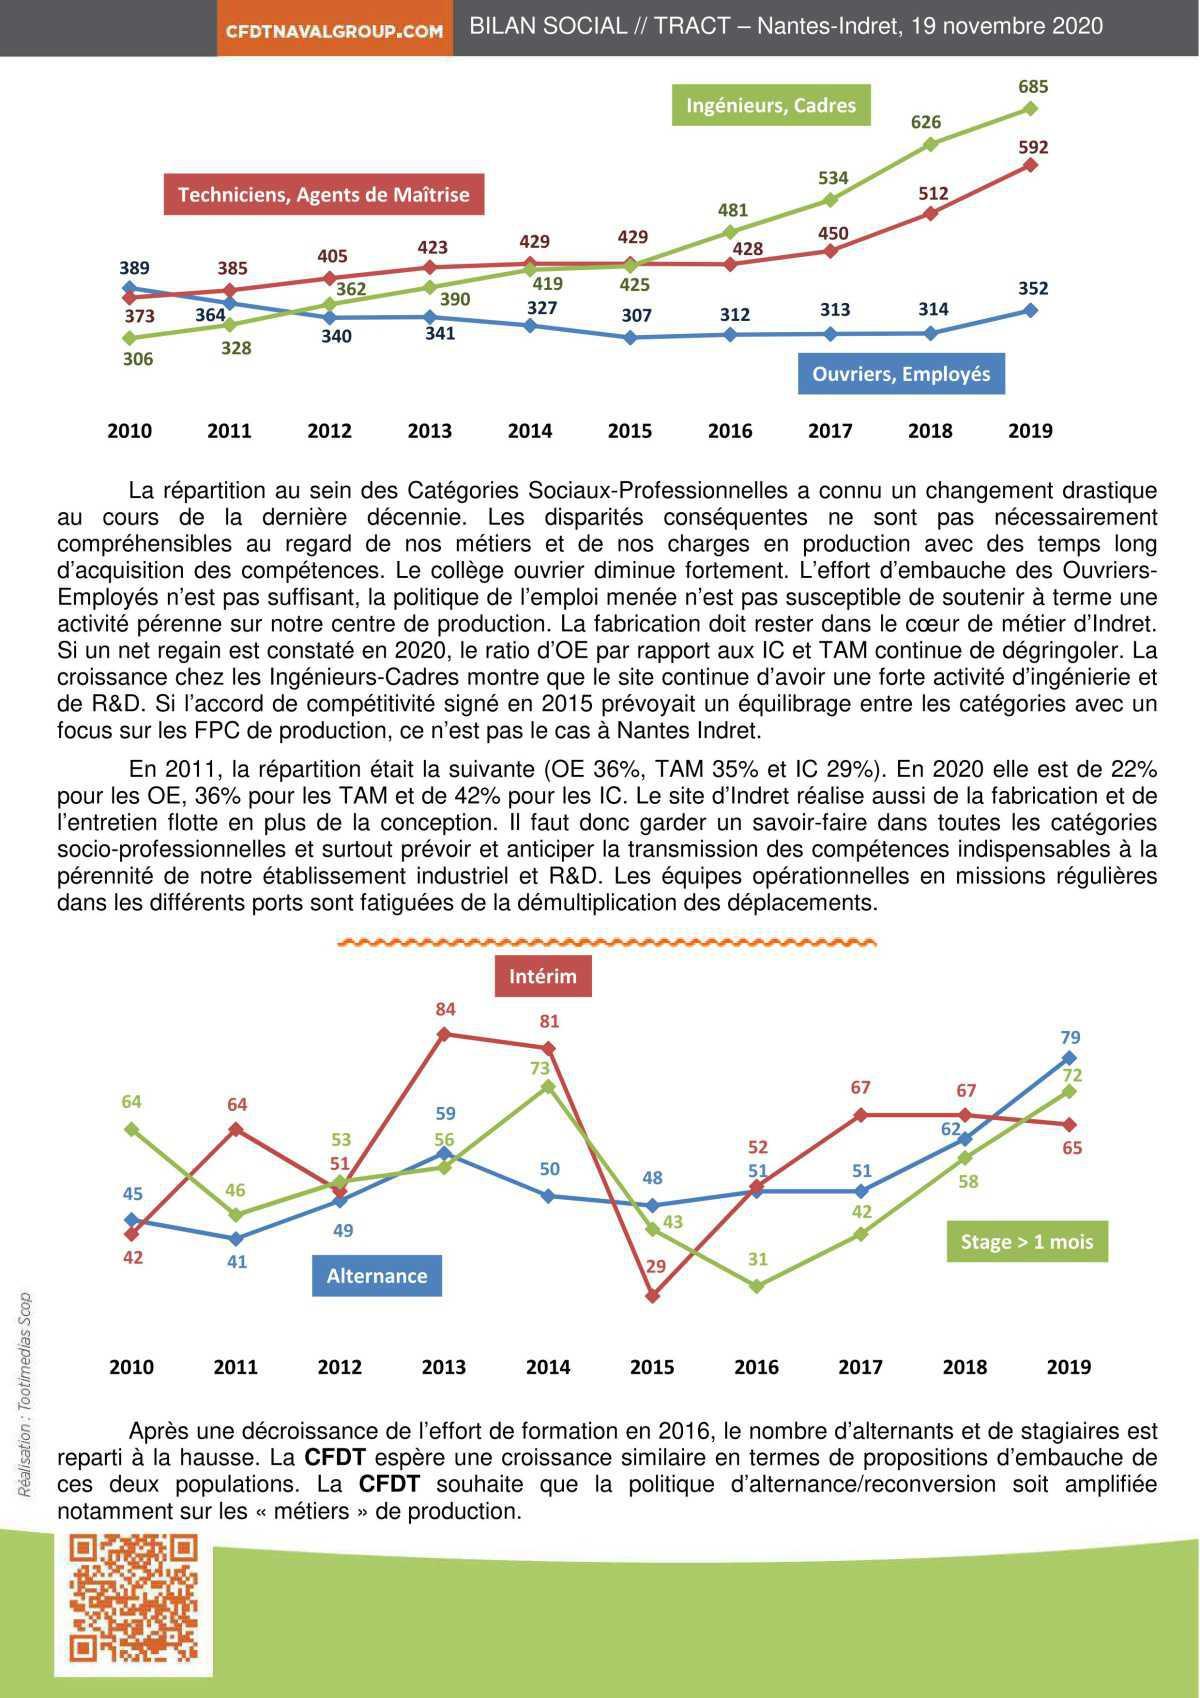 Analyse bilan social sur 10 ans